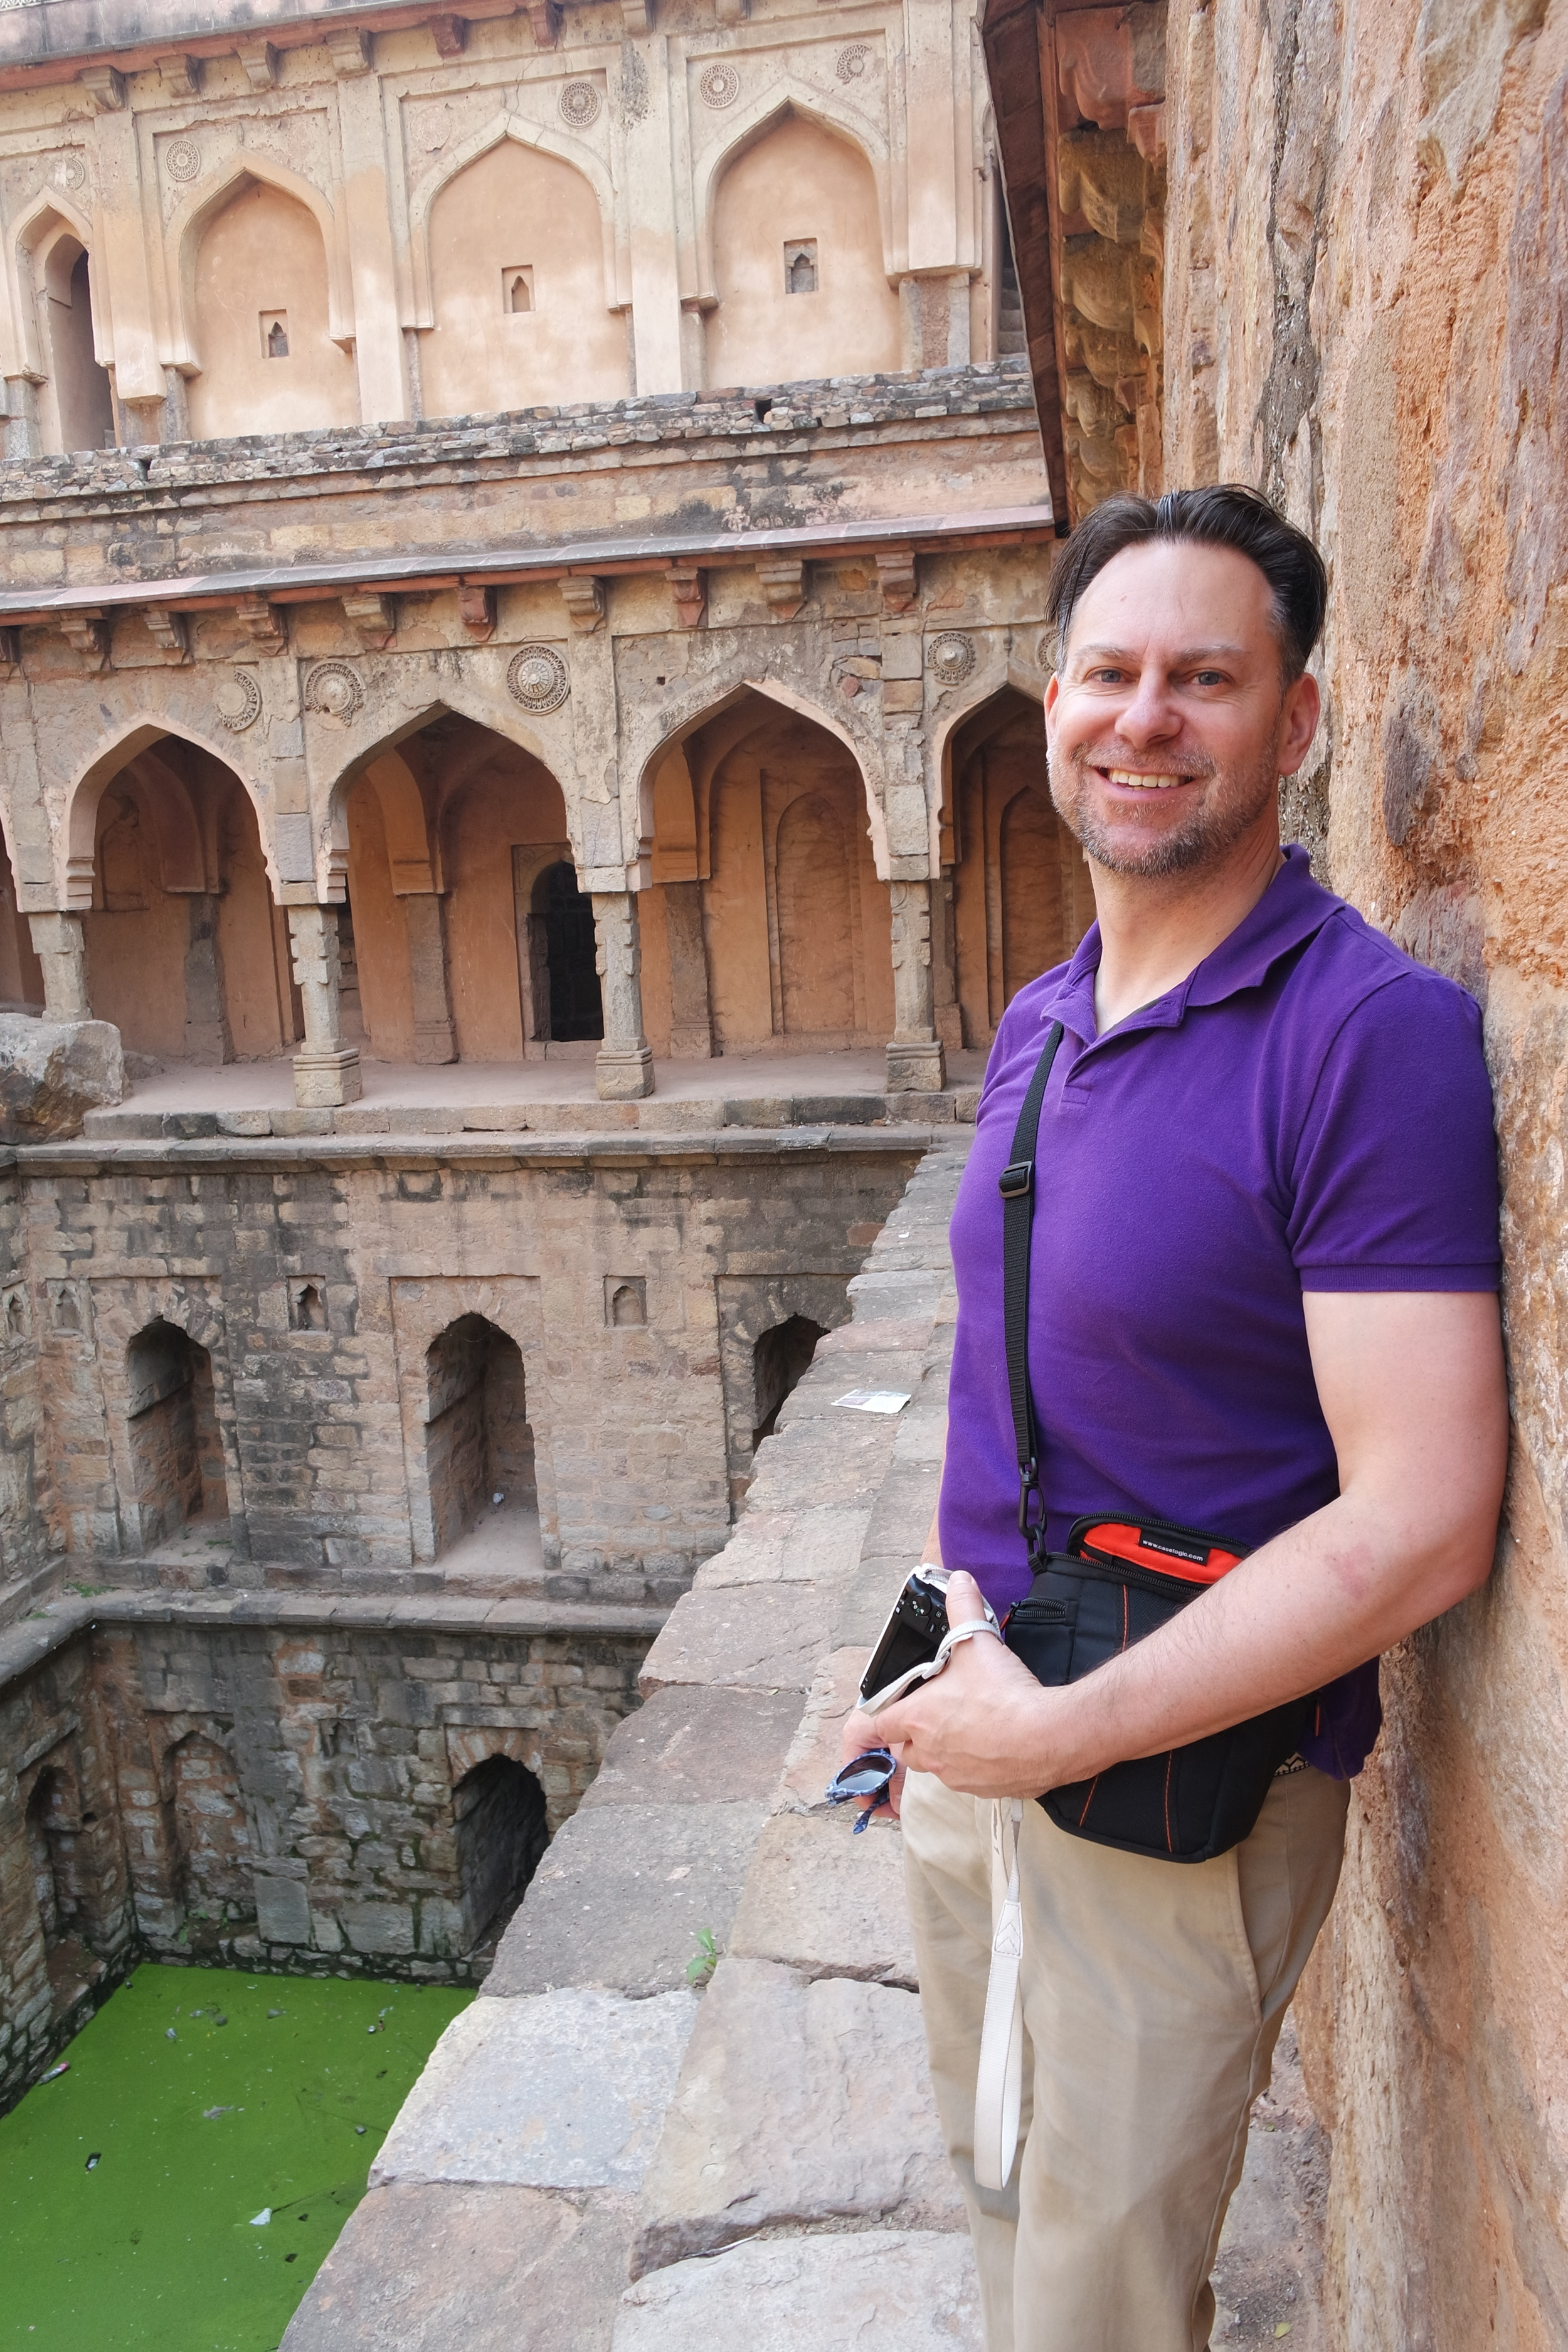 Duke at the Rajon Ki Baoli stepwell in Mehrauli Archeological Park